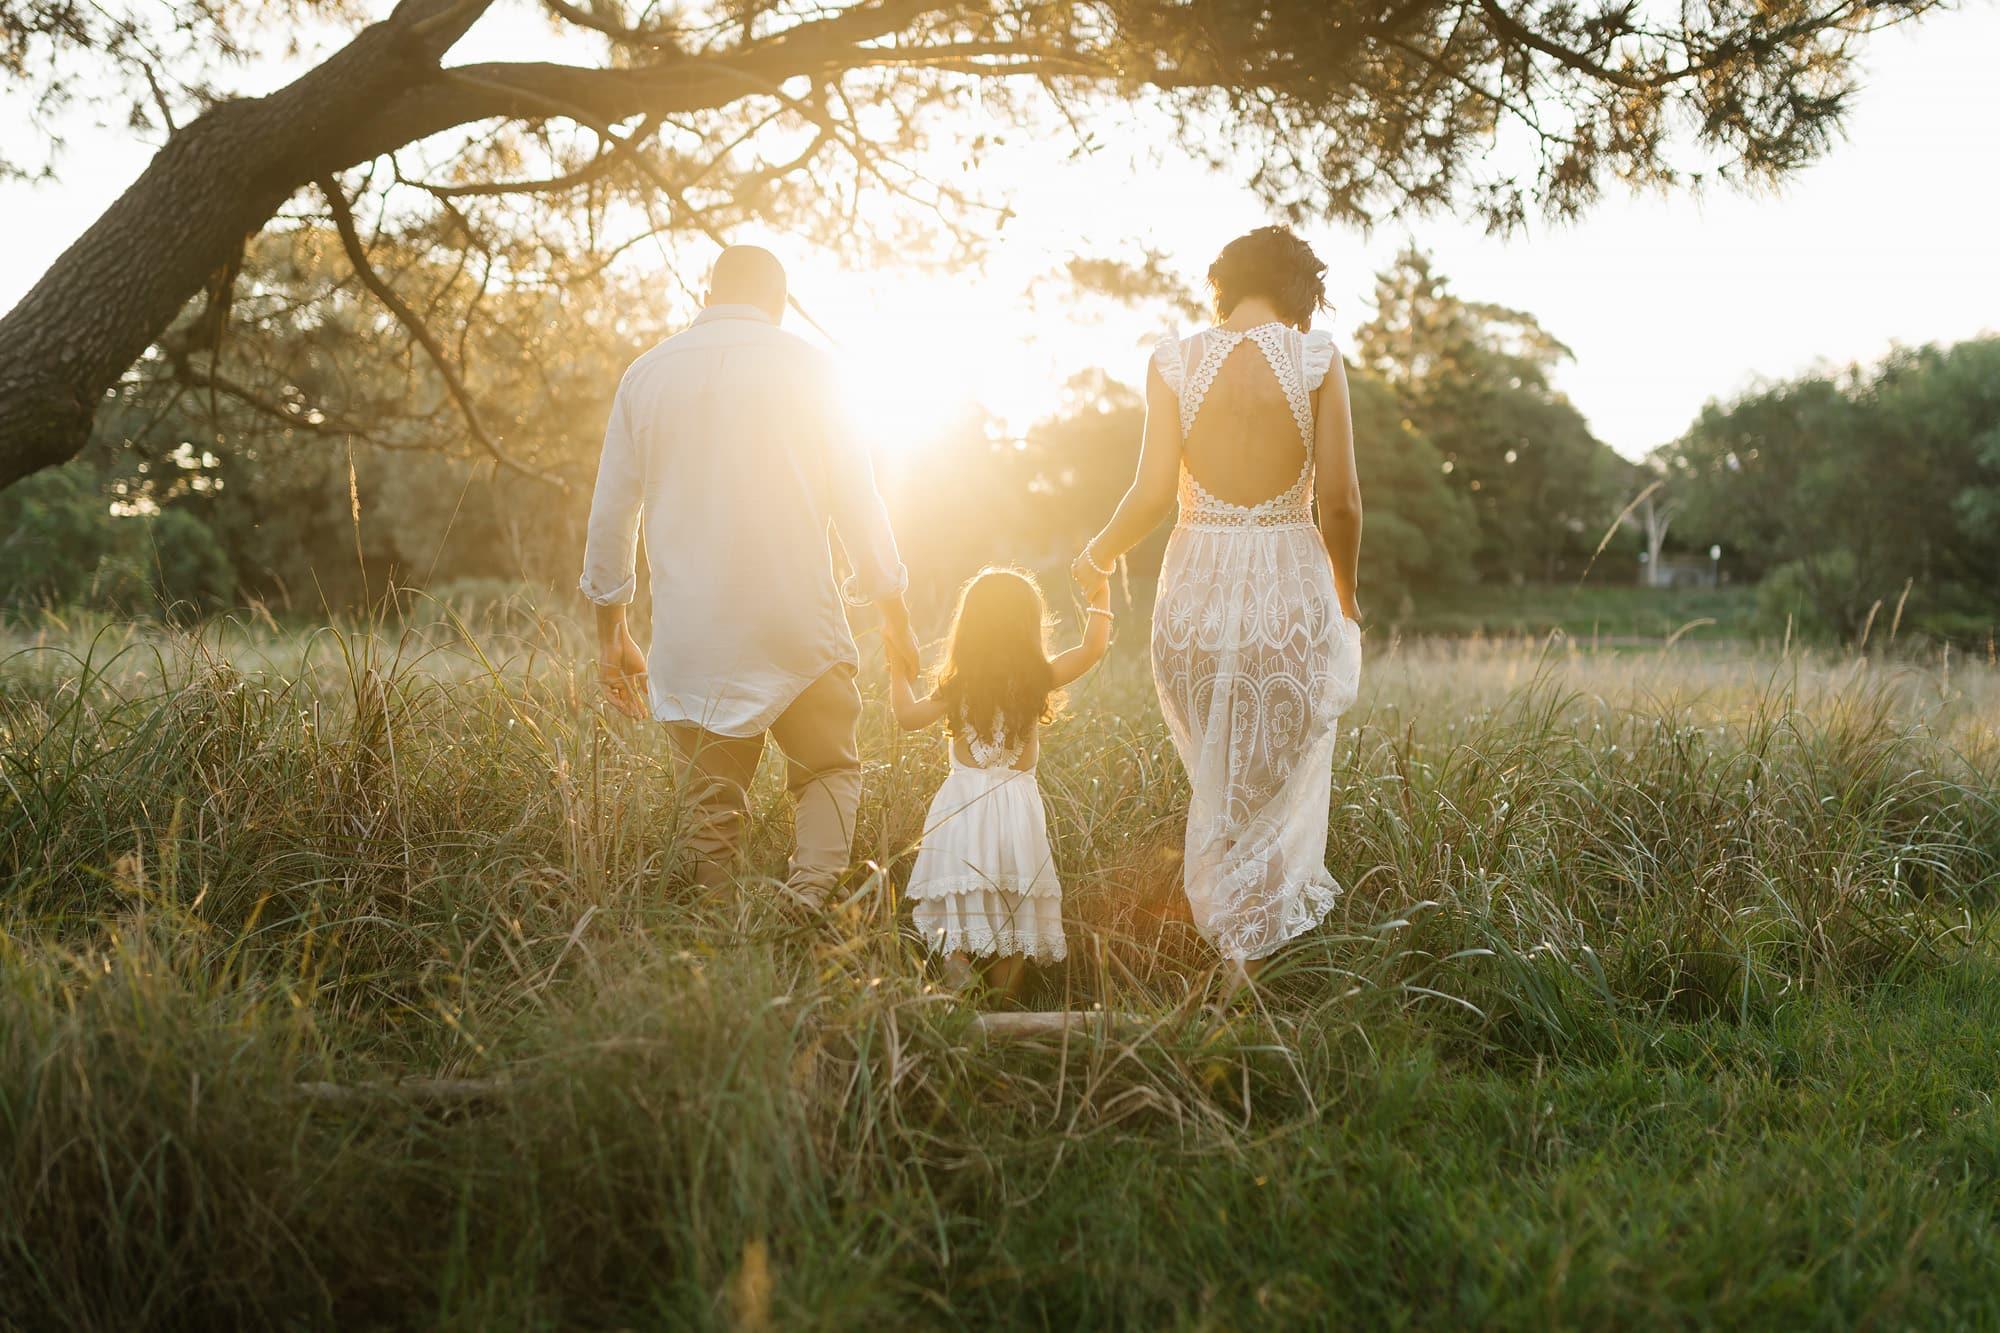 Beautiful-family-photography-sydney-sutherland-shire